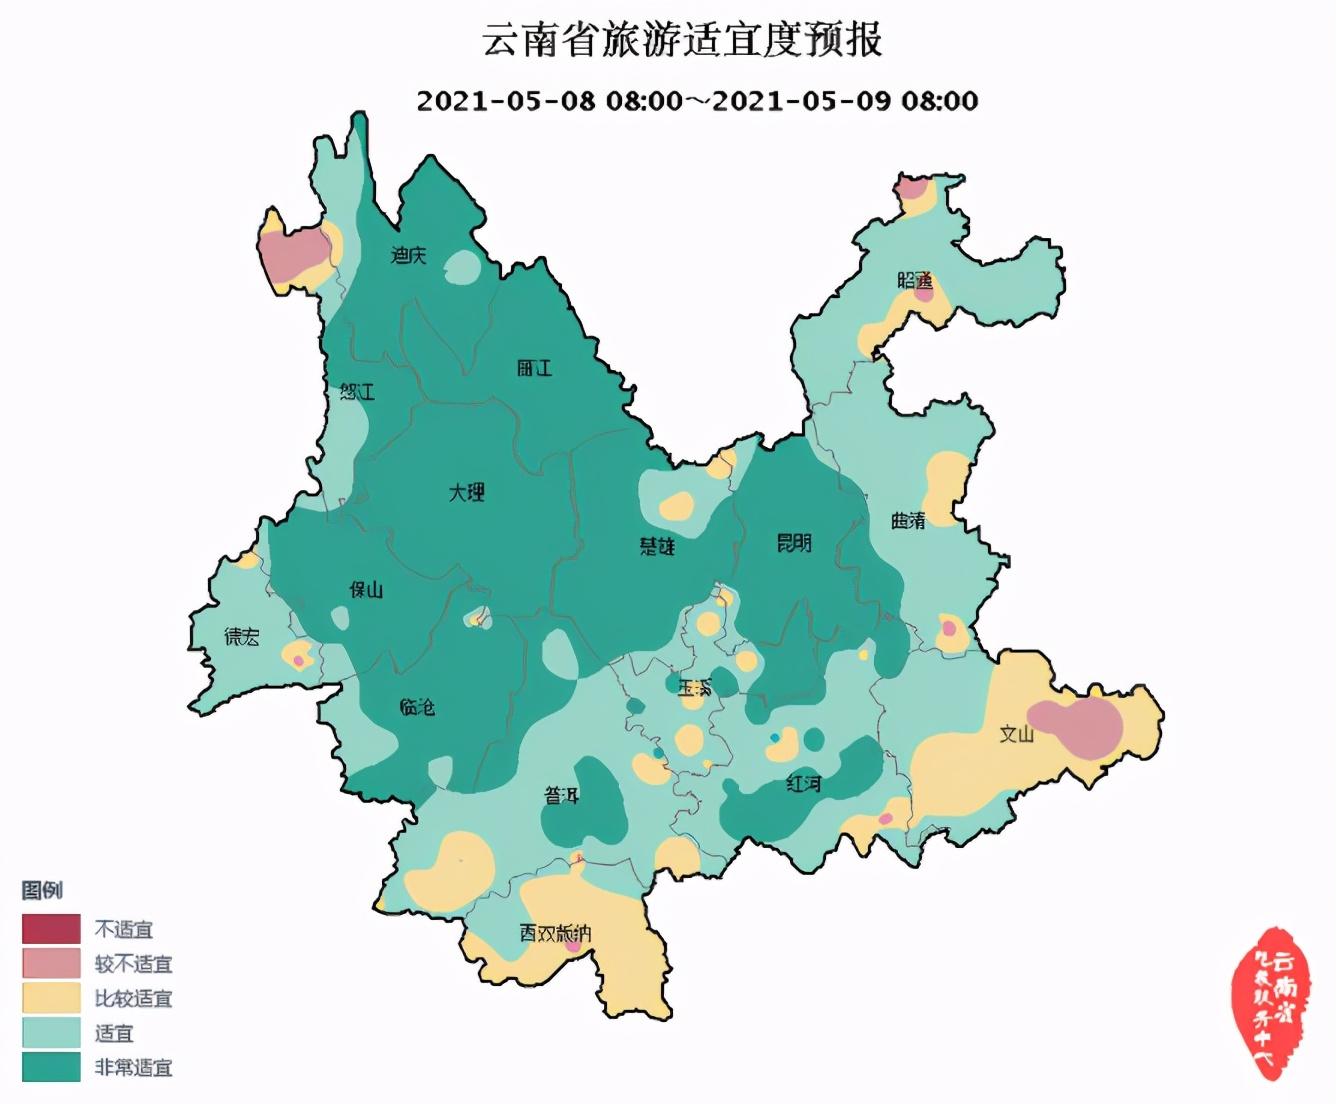 http://i.weather.com.cn/images/yunnan/tqyw/2021/05/07/6D42C43218249922EB3C424639939303.jpg